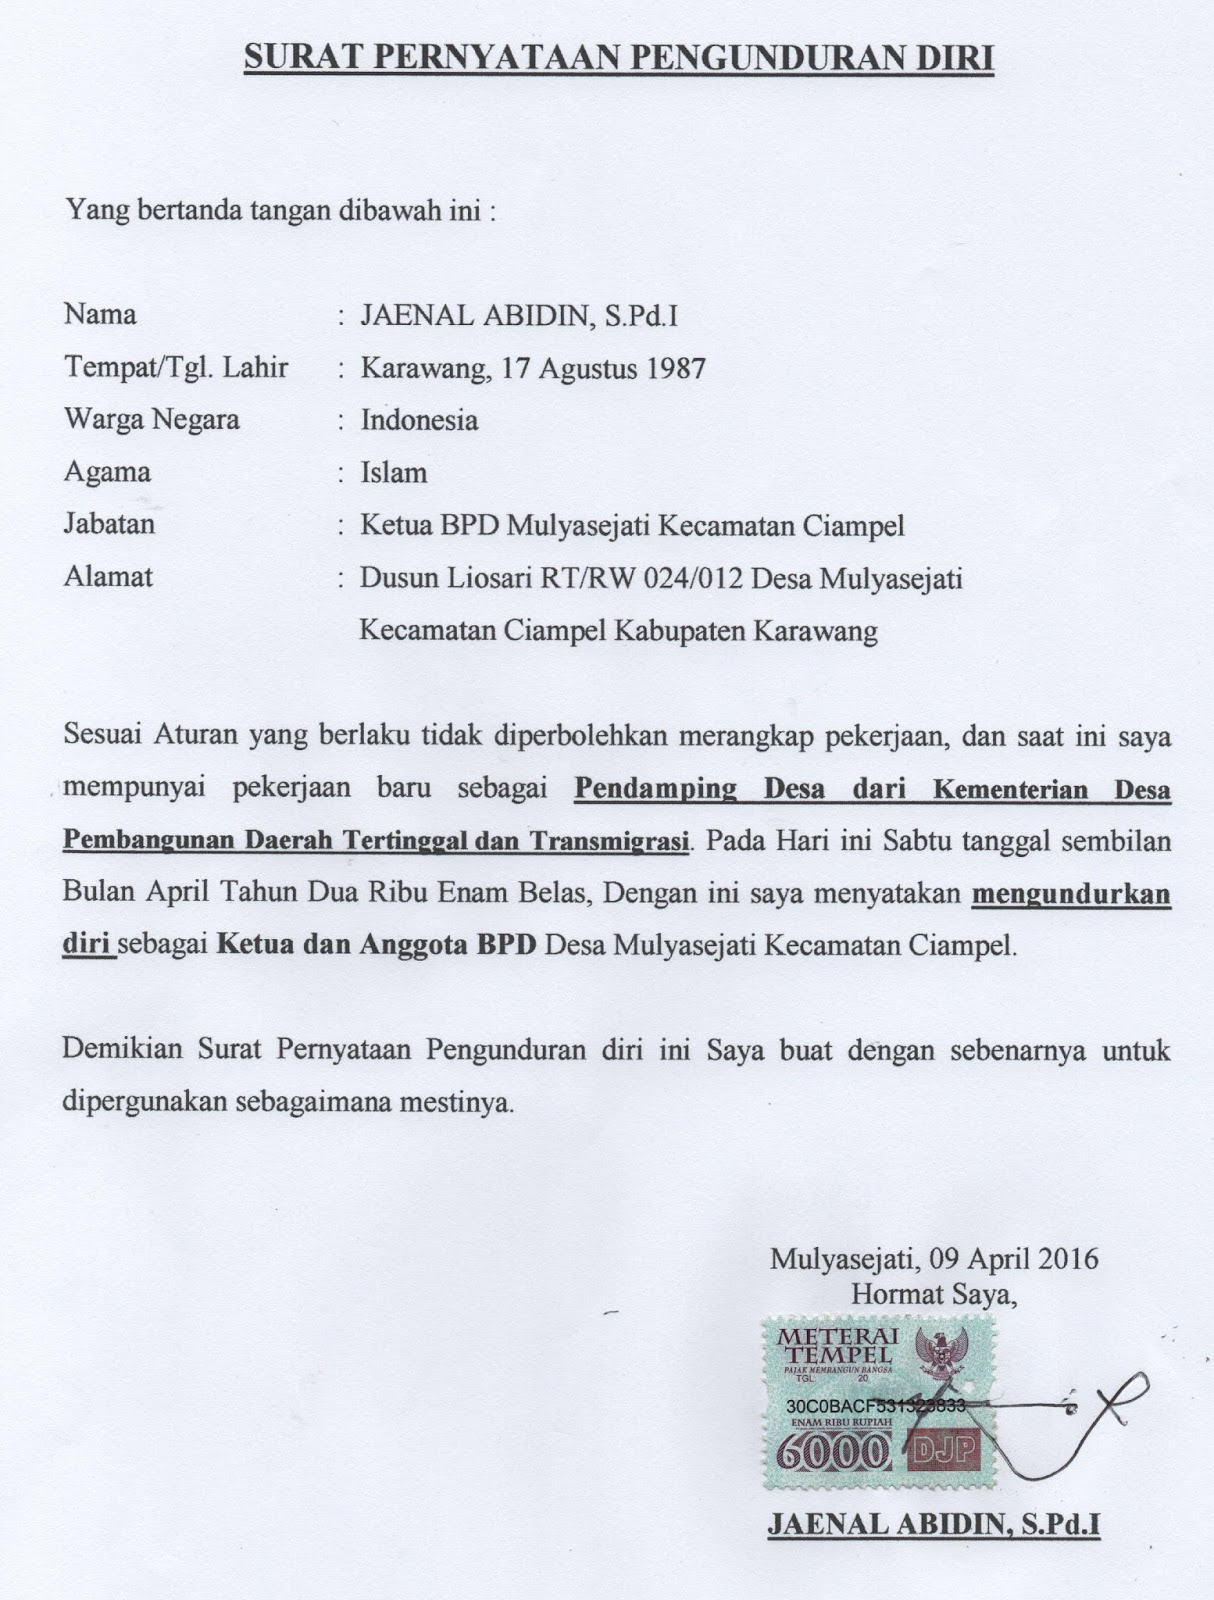 Contoh Surat Pengunduran Diri Dari Anggota Bpd